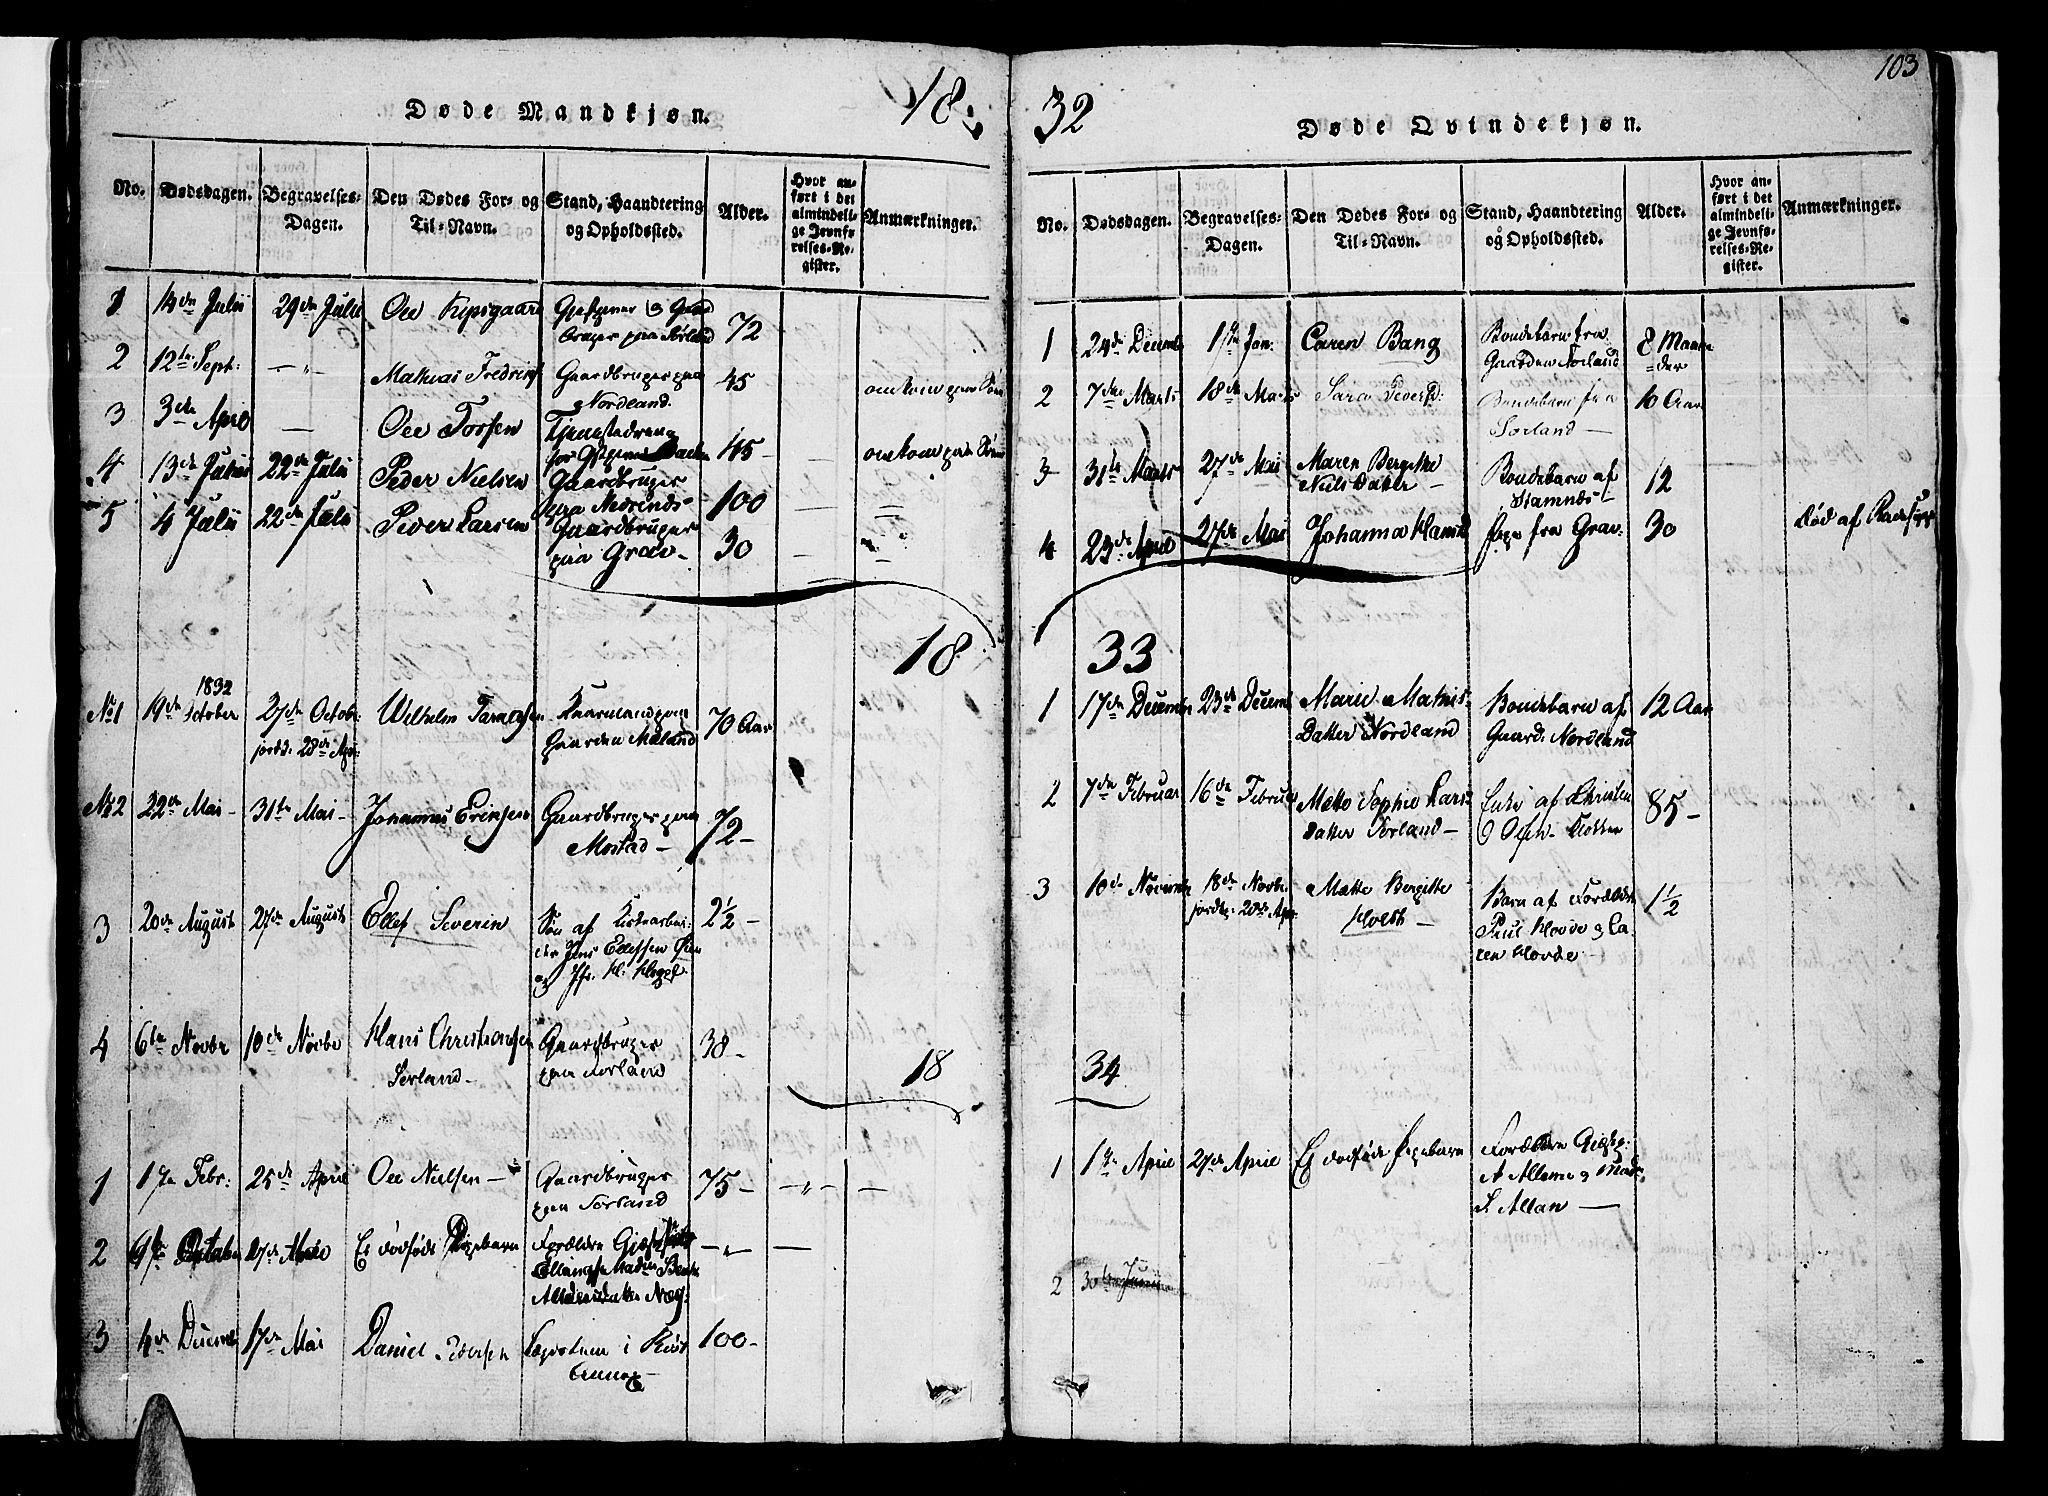 SAT, Ministerialprotokoller, klokkerbøker og fødselsregistre - Nordland, 807/L0120: Ministerialbok nr. 807A03, 1821-1848, s. 103